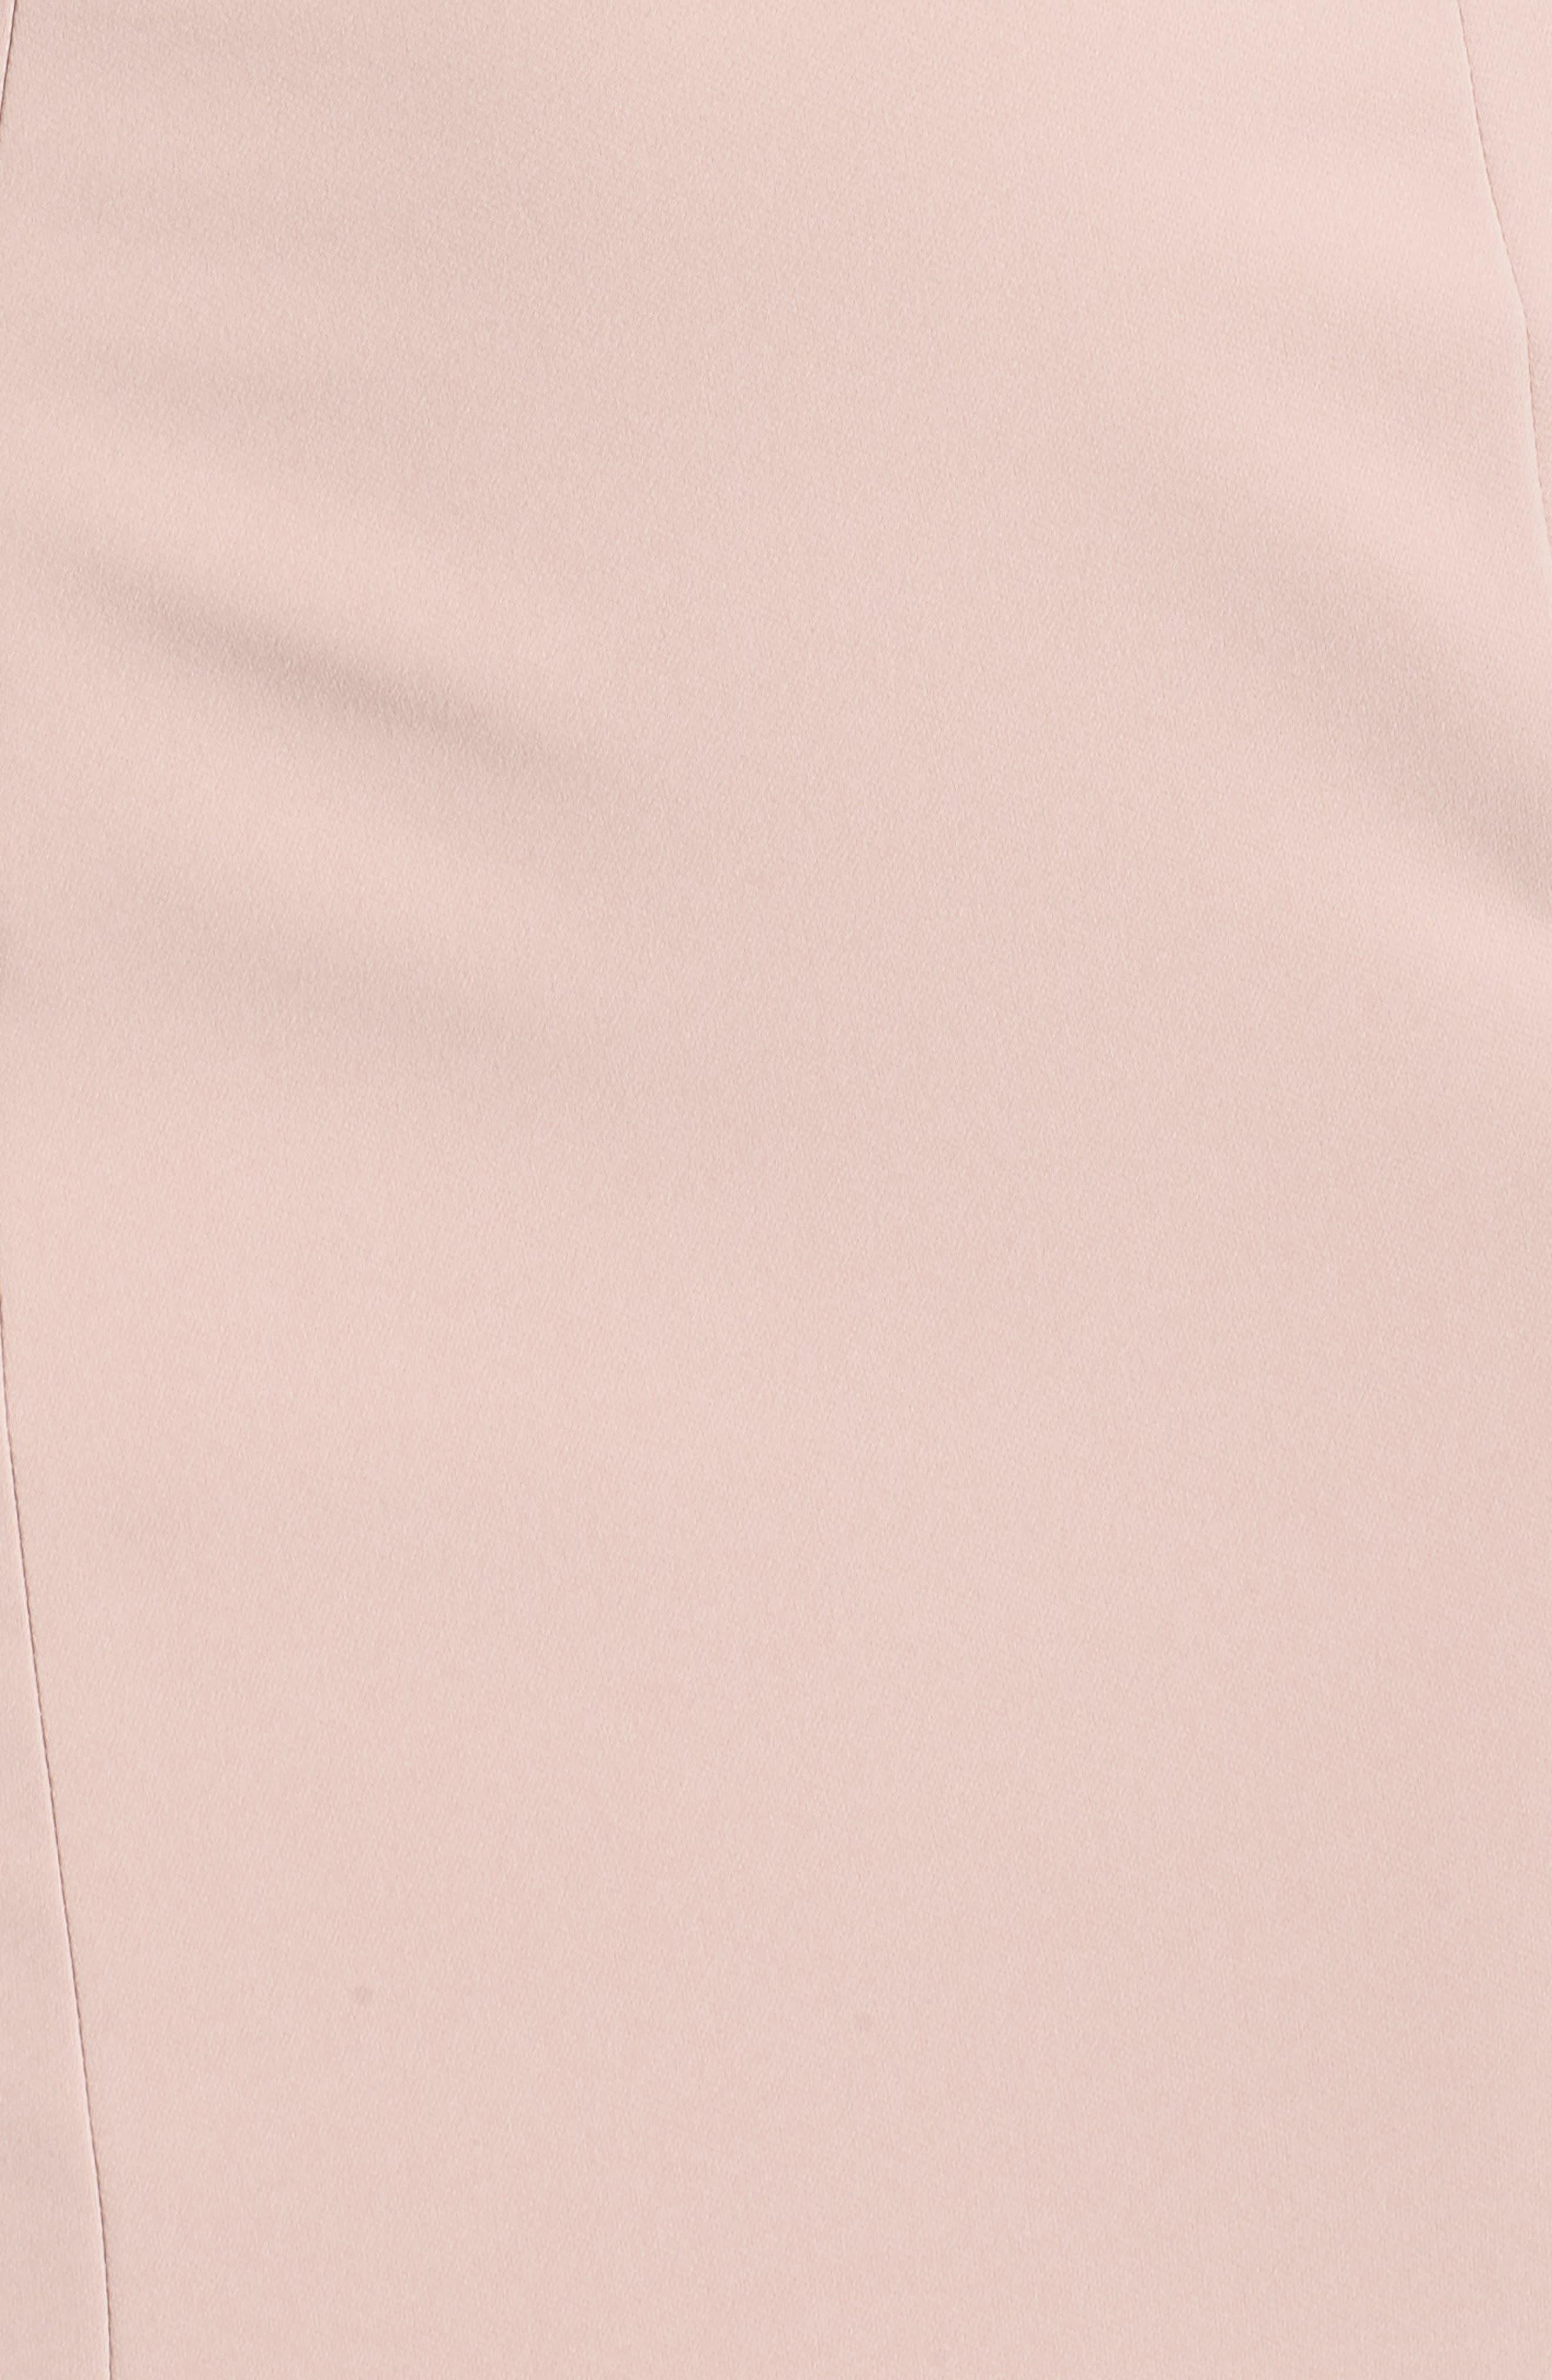 Milly Lace Flounce Slipdress,                             Alternate thumbnail 5, color,                             Blush